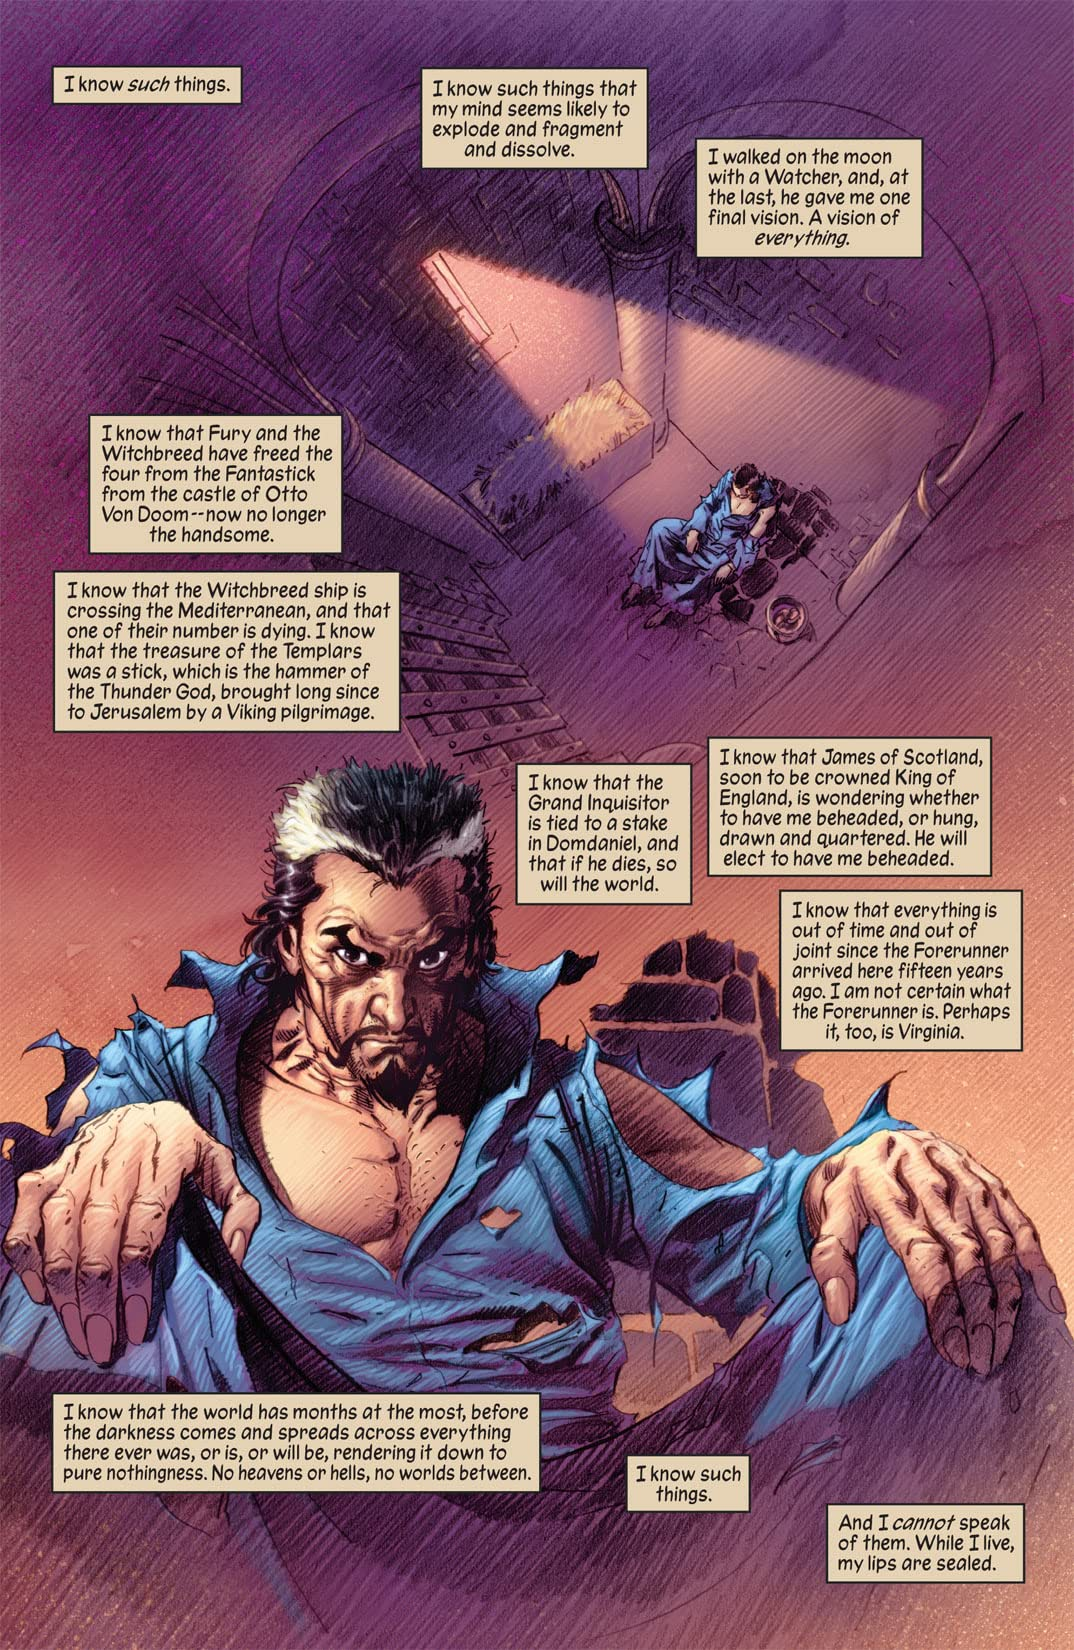 Marvel 1602 #7